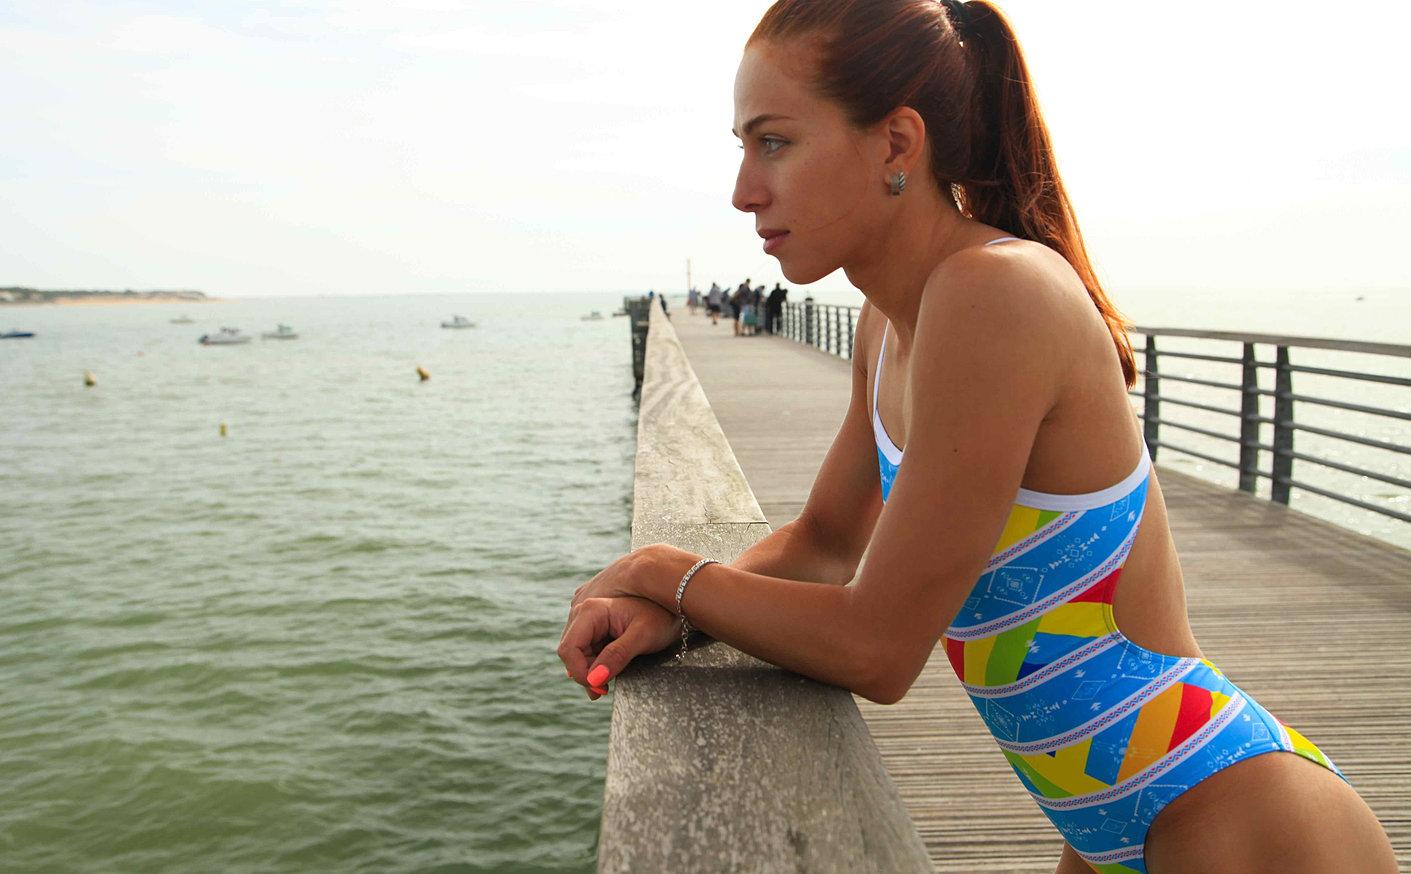 mako sport maillots de bain combinaisons triathlon et natation. Black Bedroom Furniture Sets. Home Design Ideas